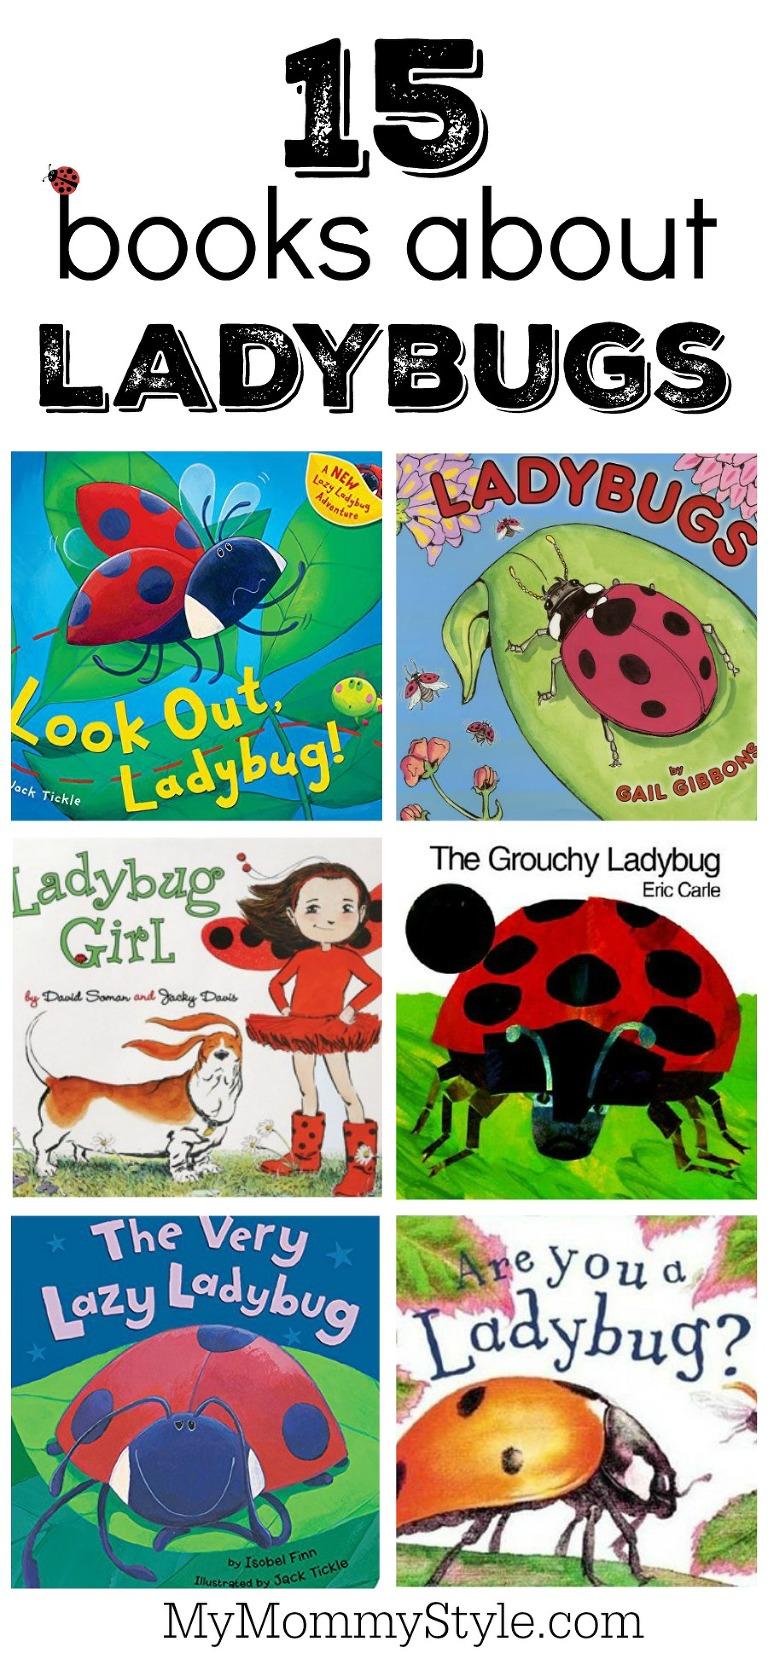 15 books about ladybugs